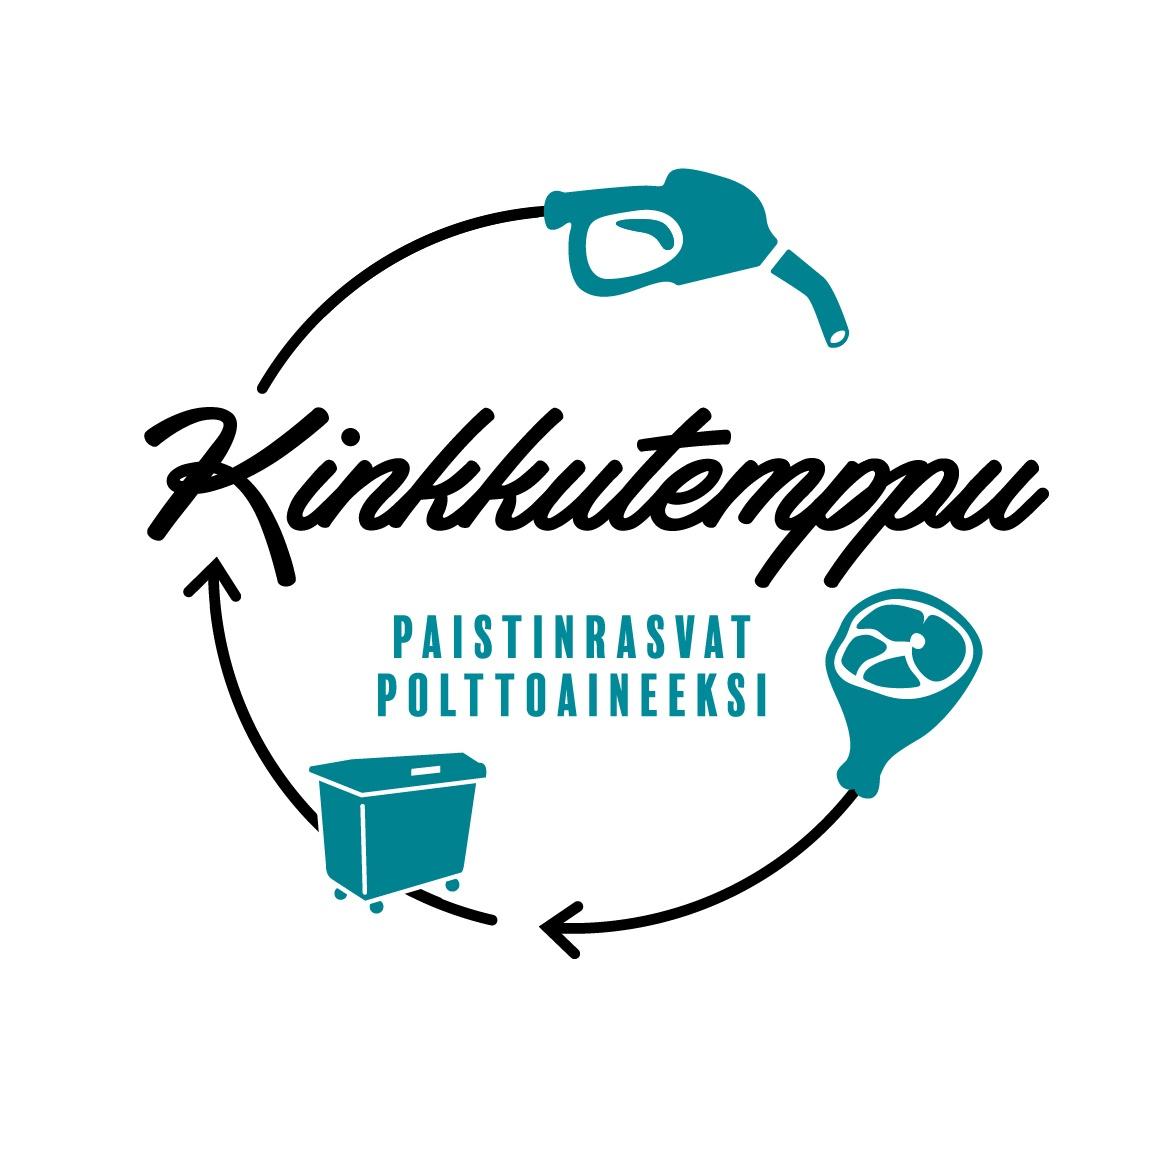 kinkkutemppu_logo_2017-1.jpg